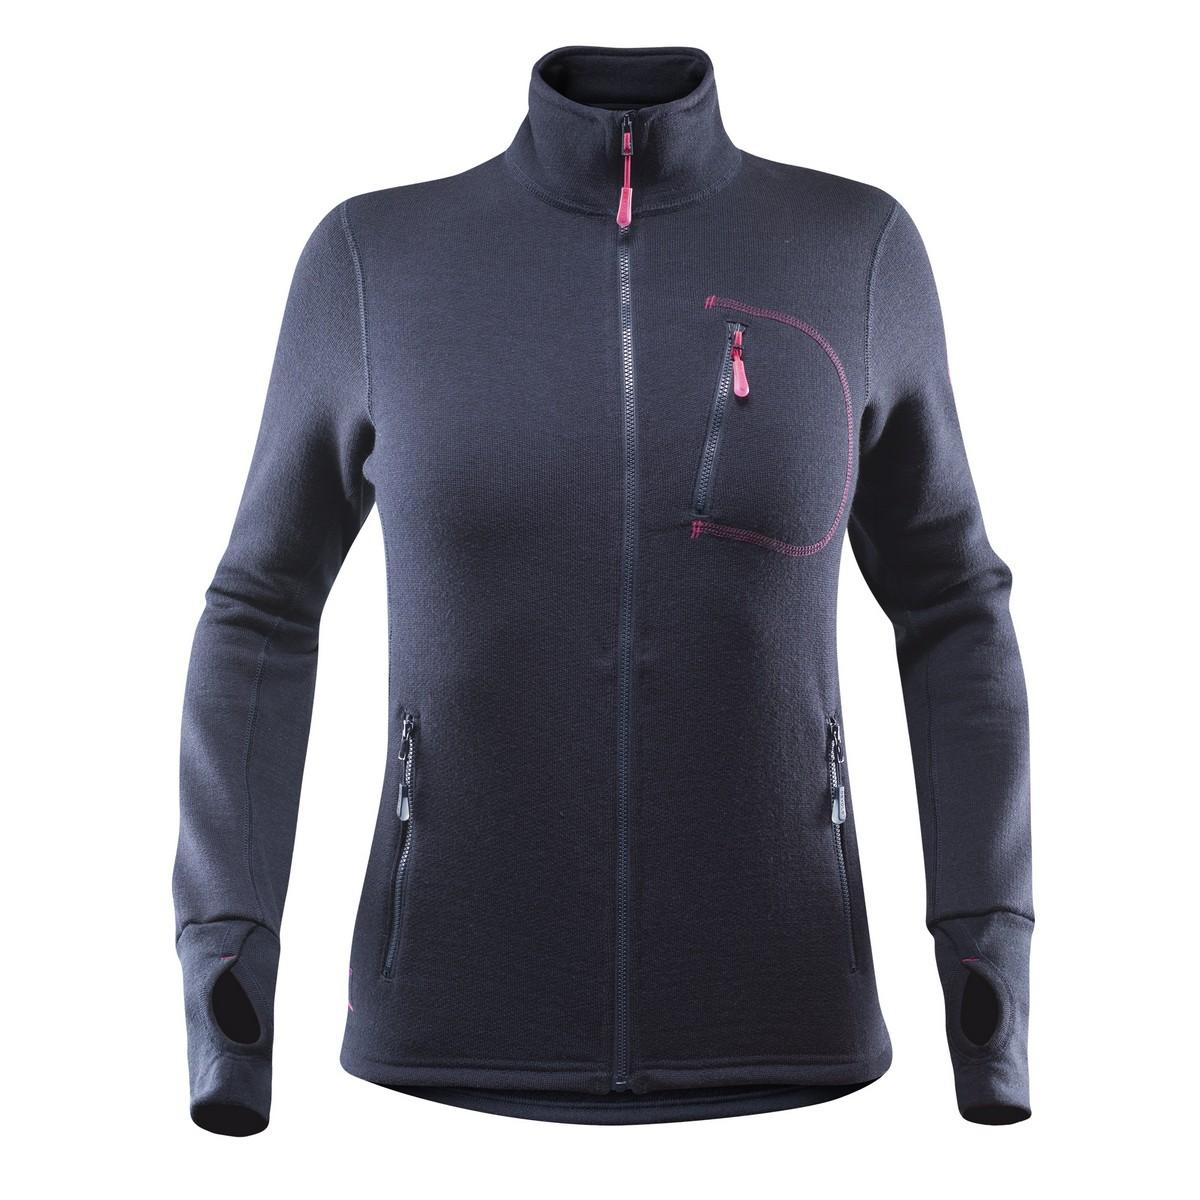 Devold mikina Thermo woman jacket Velikost: S